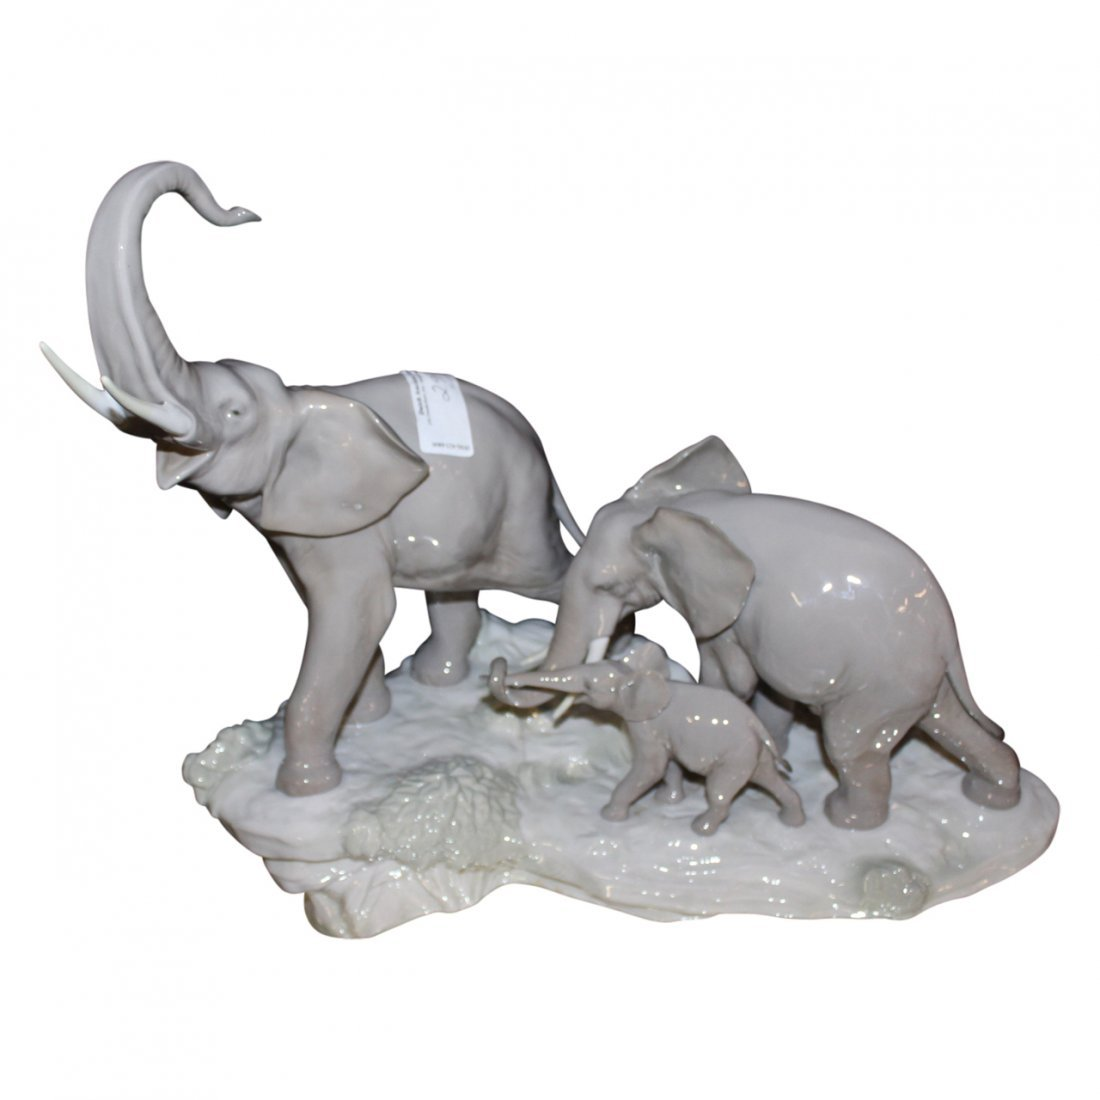 Lladro Porcelain Elephant Group